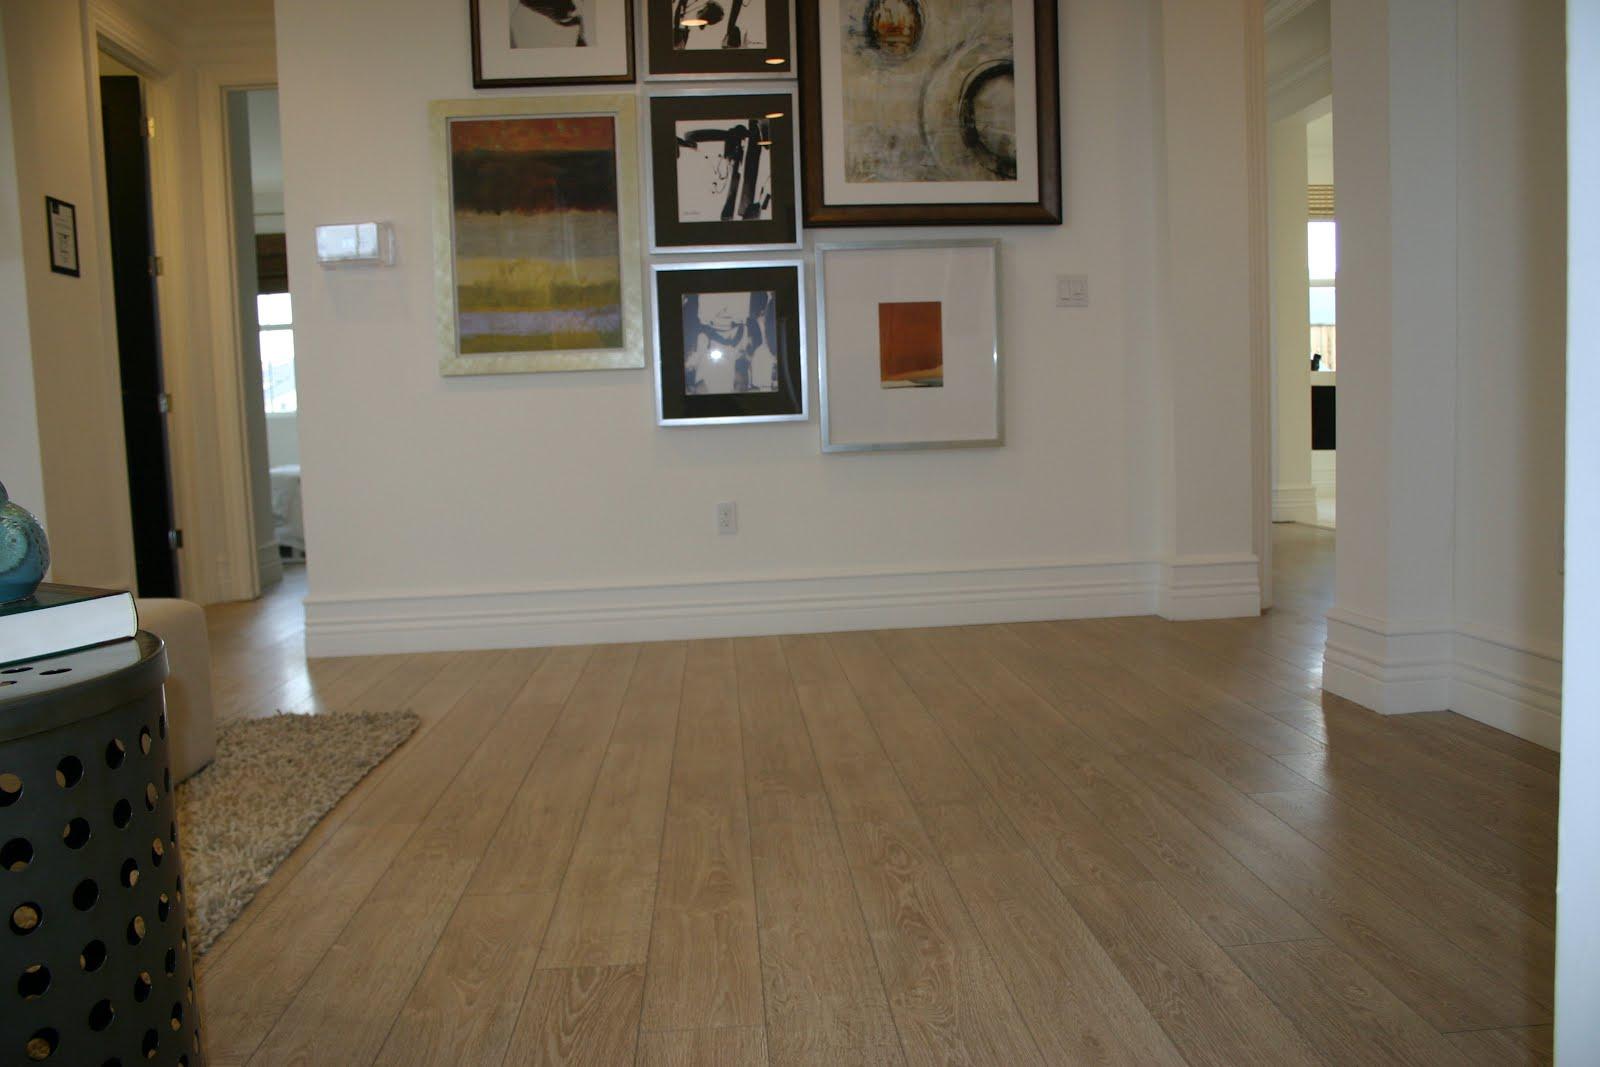 Simas floor and design company laminate floors by mannington for Laminate flooring dublin